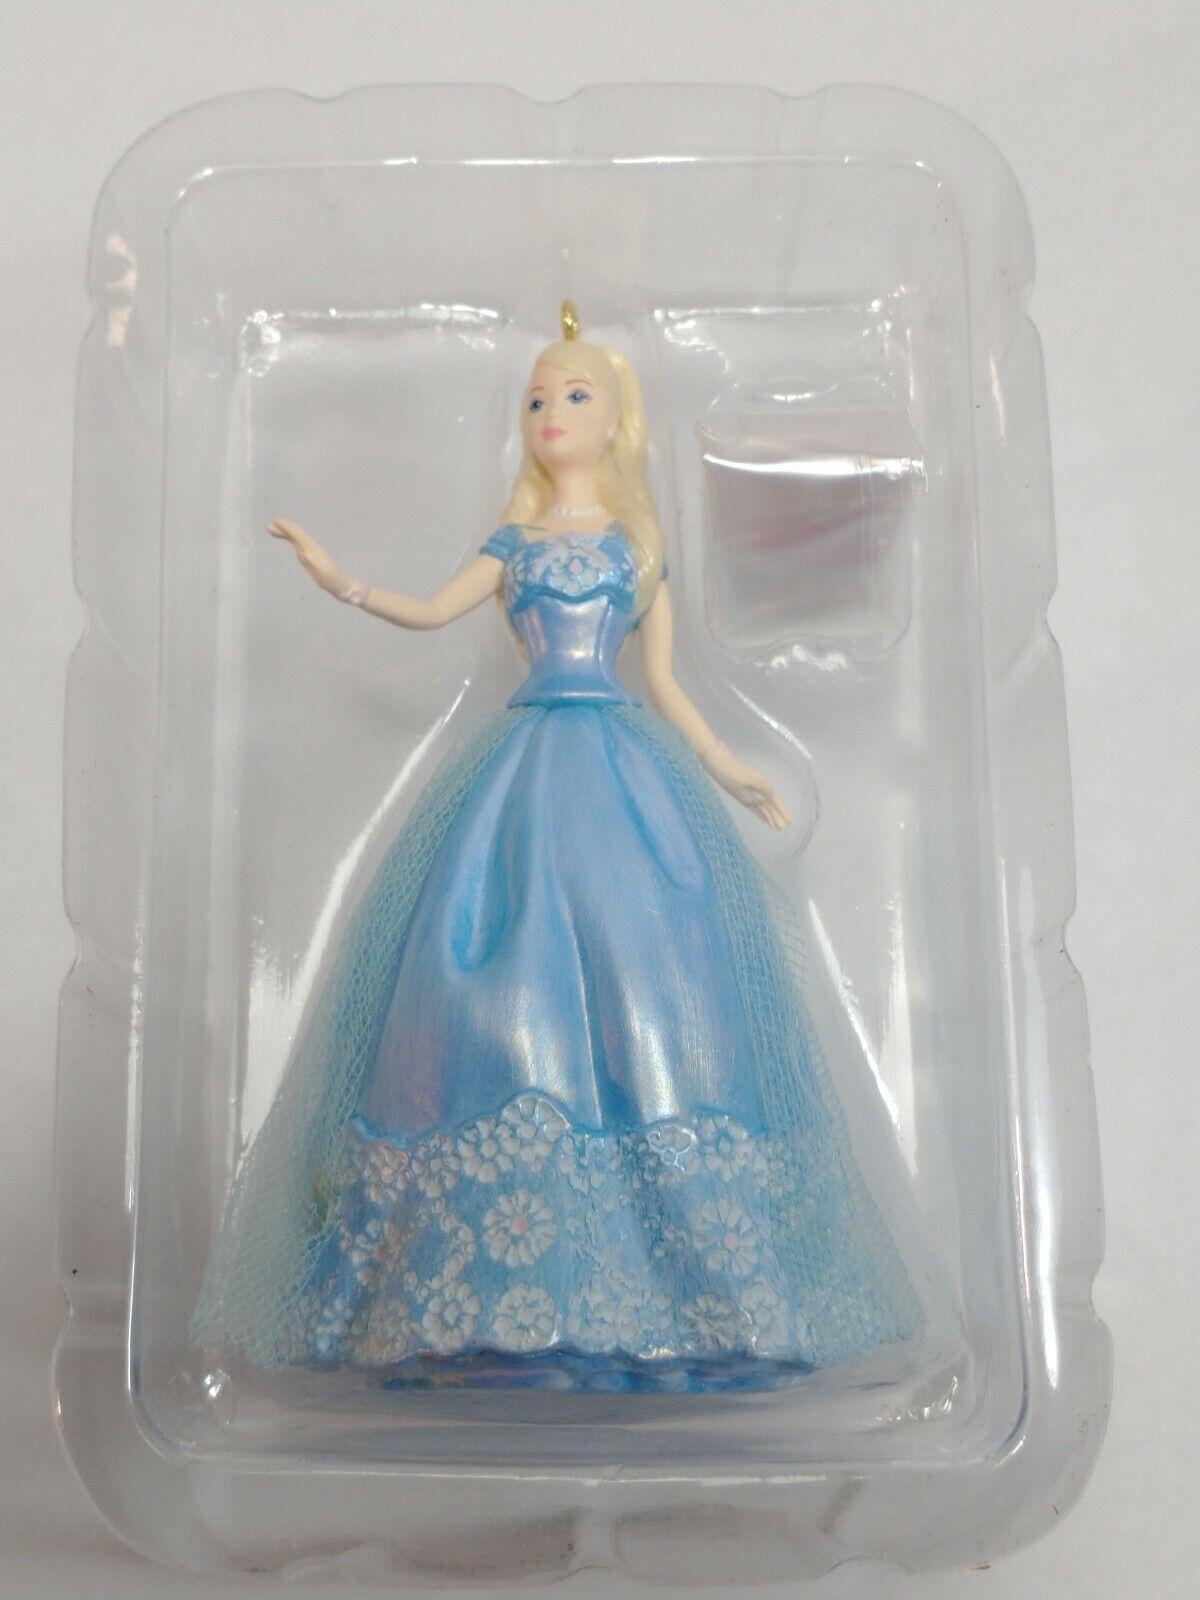 Barbie Christmas Handcrafted Barbie as Birthday Wishes Doll Birthday Wishes Barbie Ornament Ornament Hallmark Keepsake